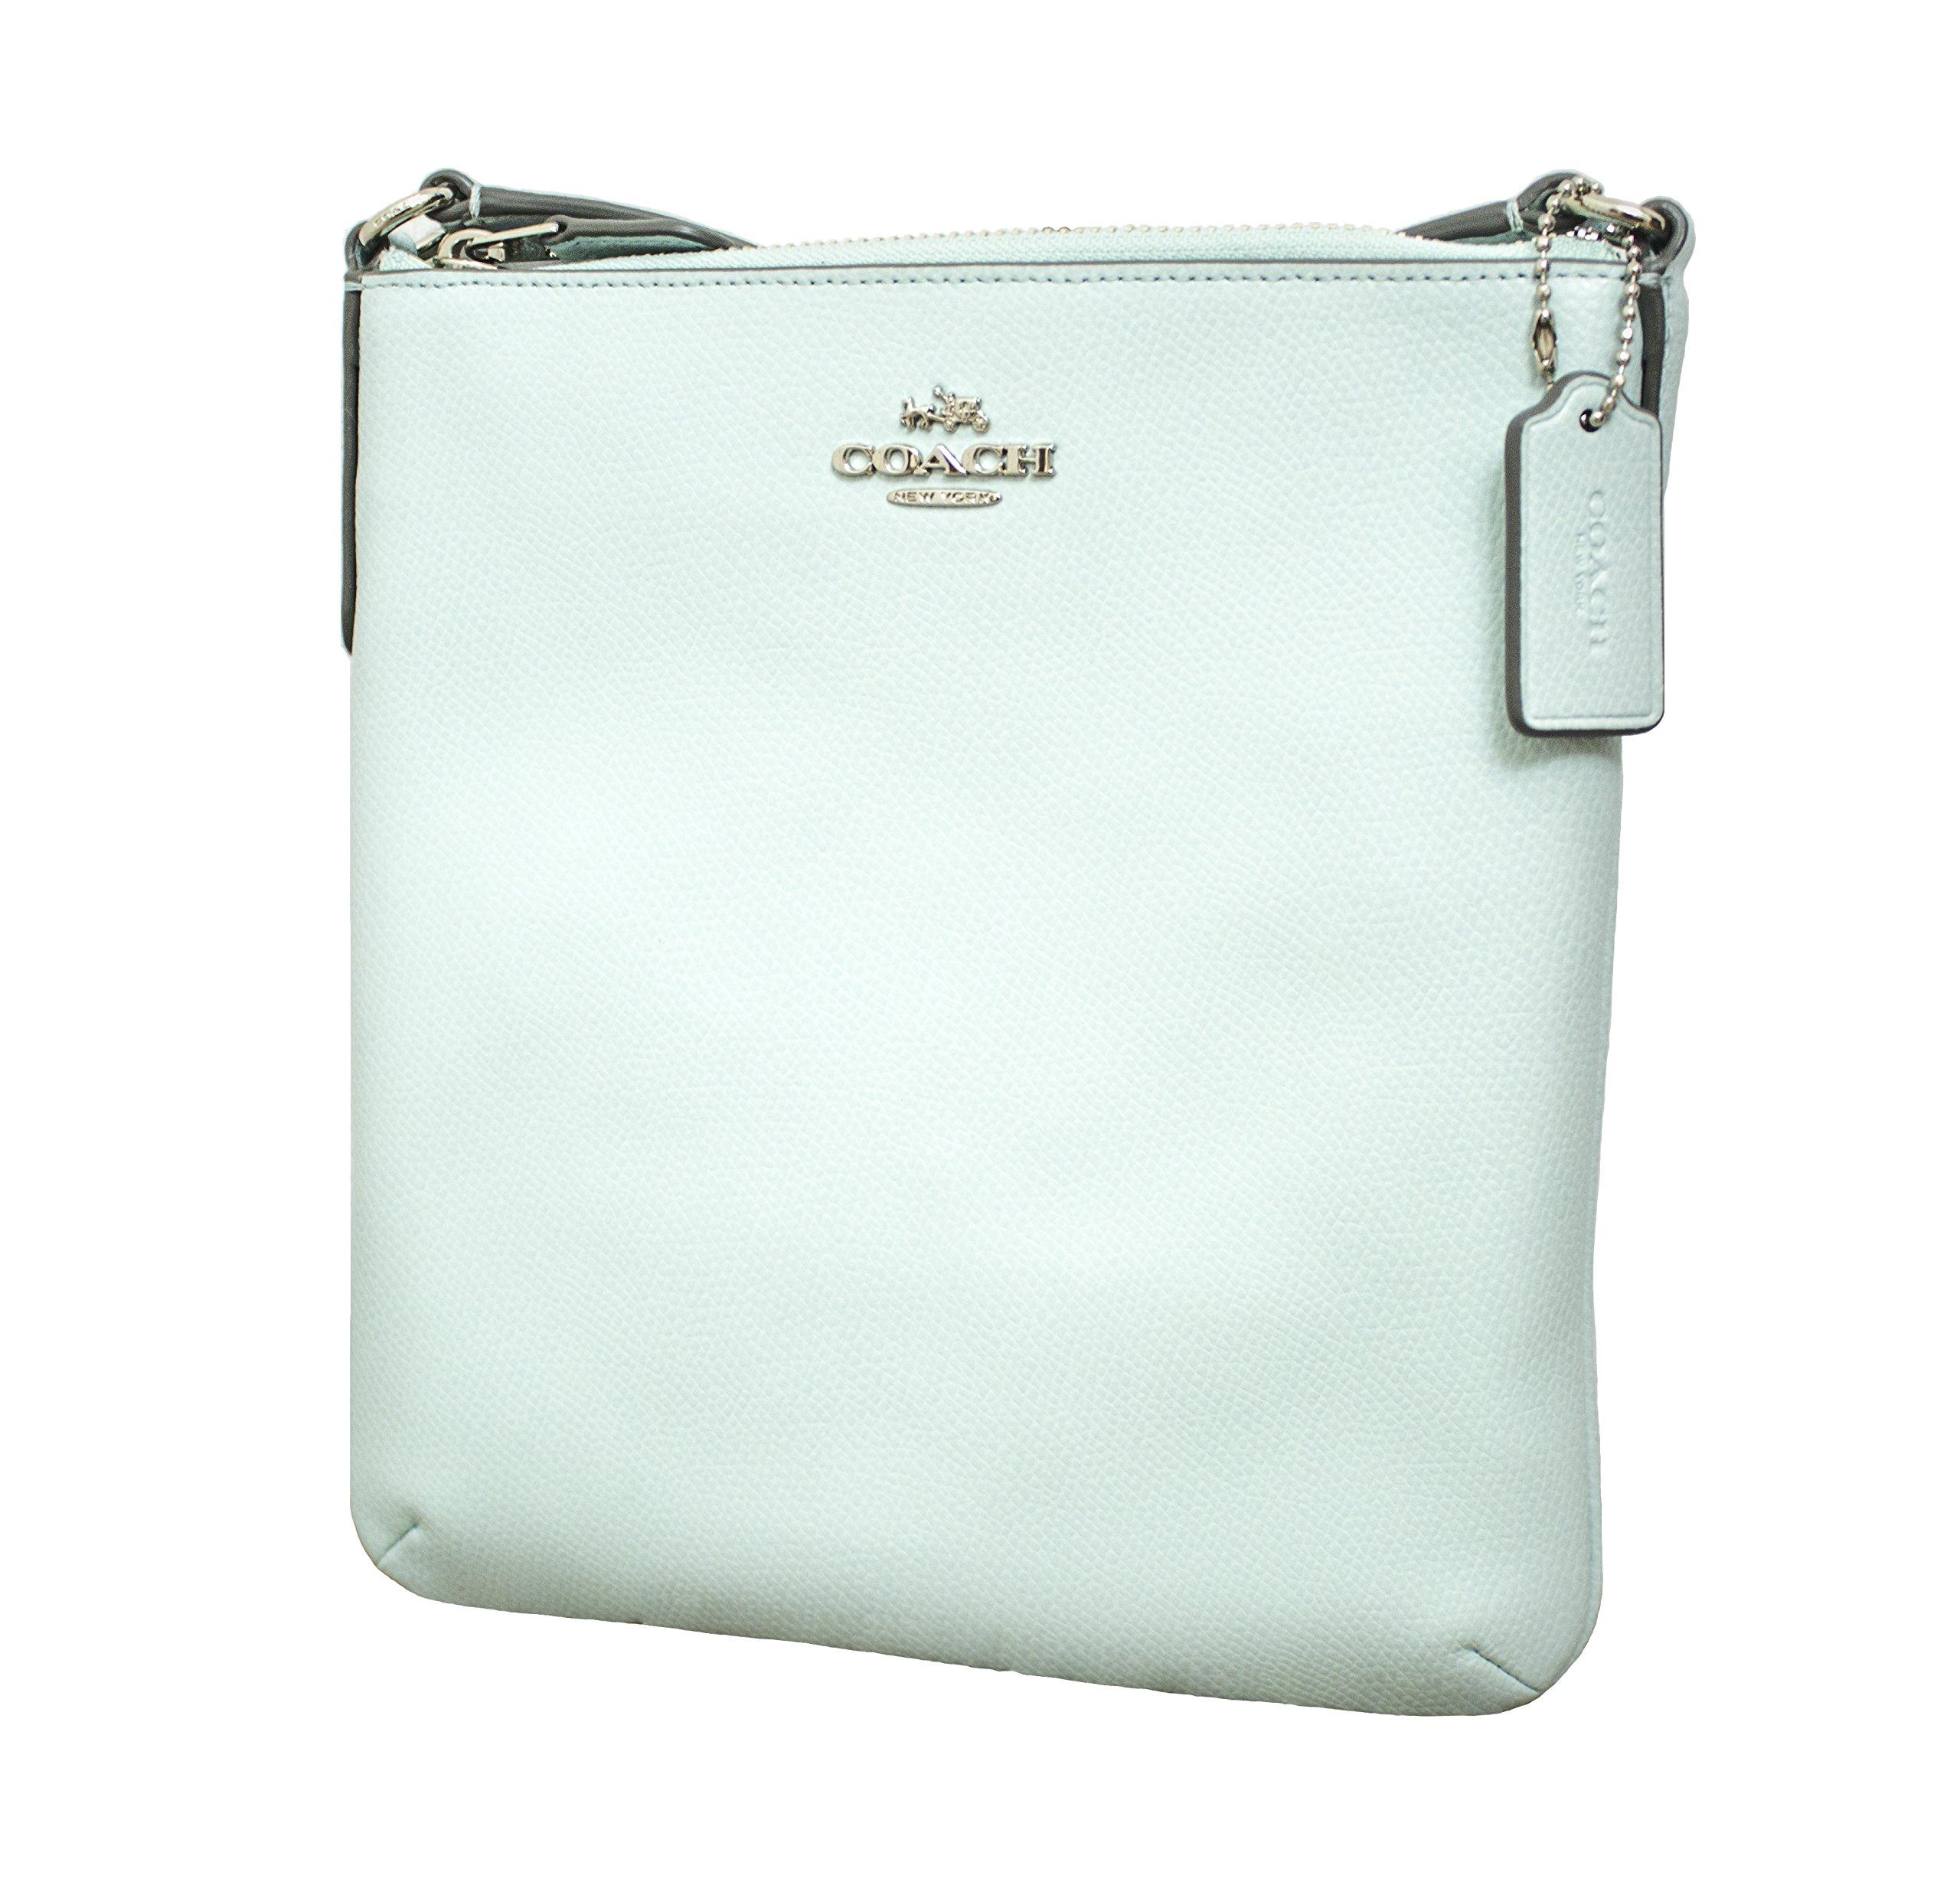 Coach Crossgrain North South Crossbody Handbag Seaglass by Coach